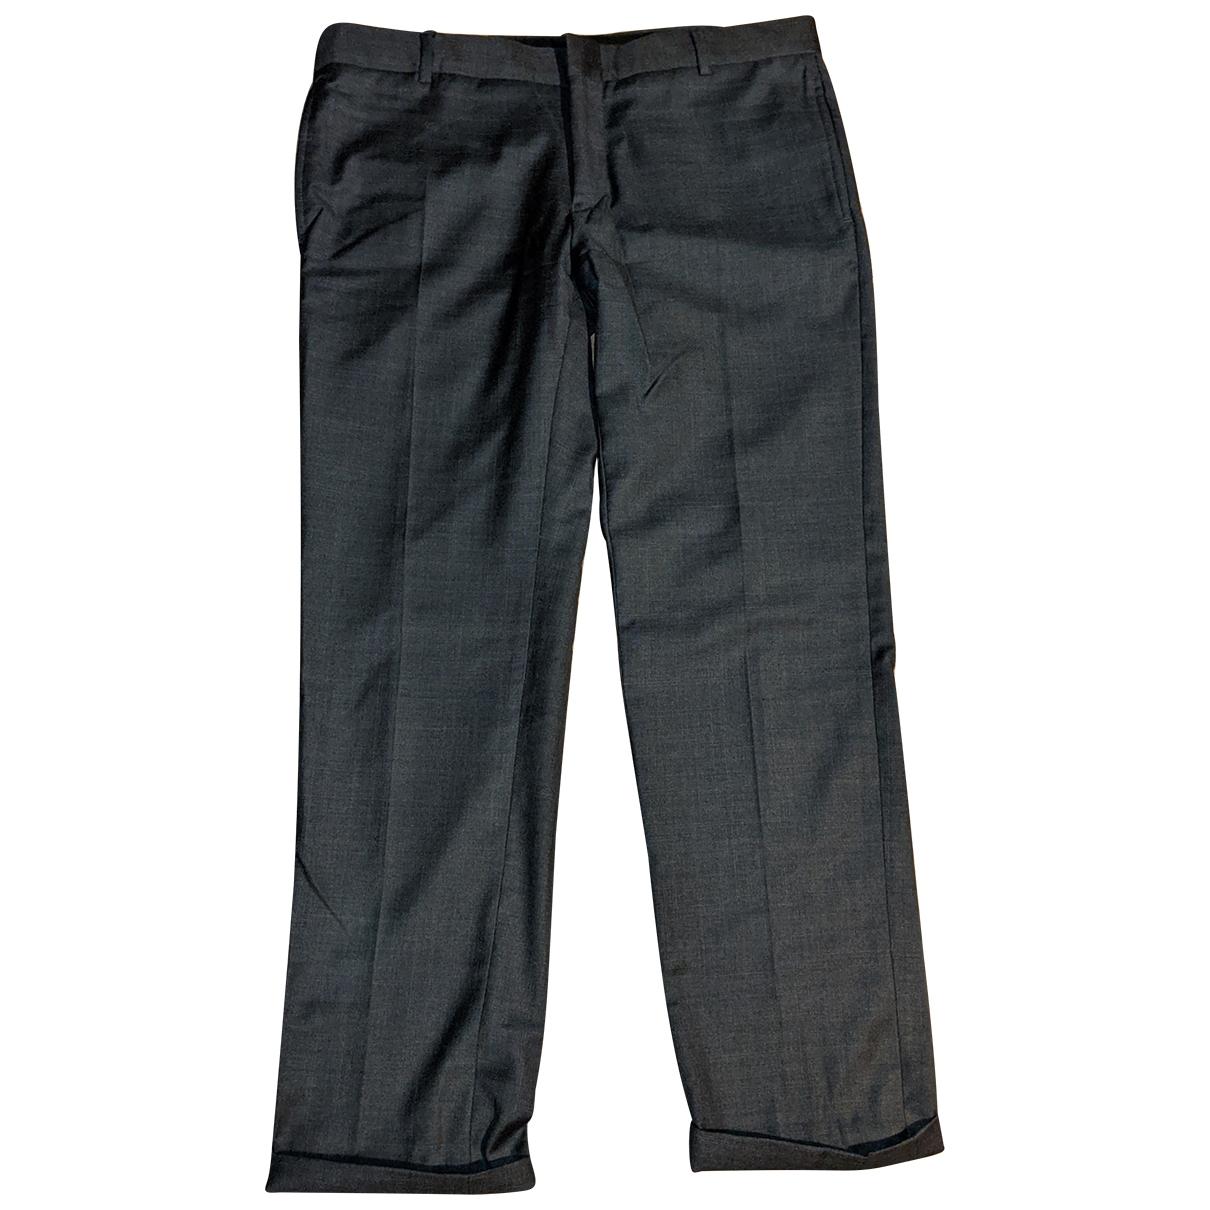 Daniele Alessandrini \N Black Wool Trousers for Men M International